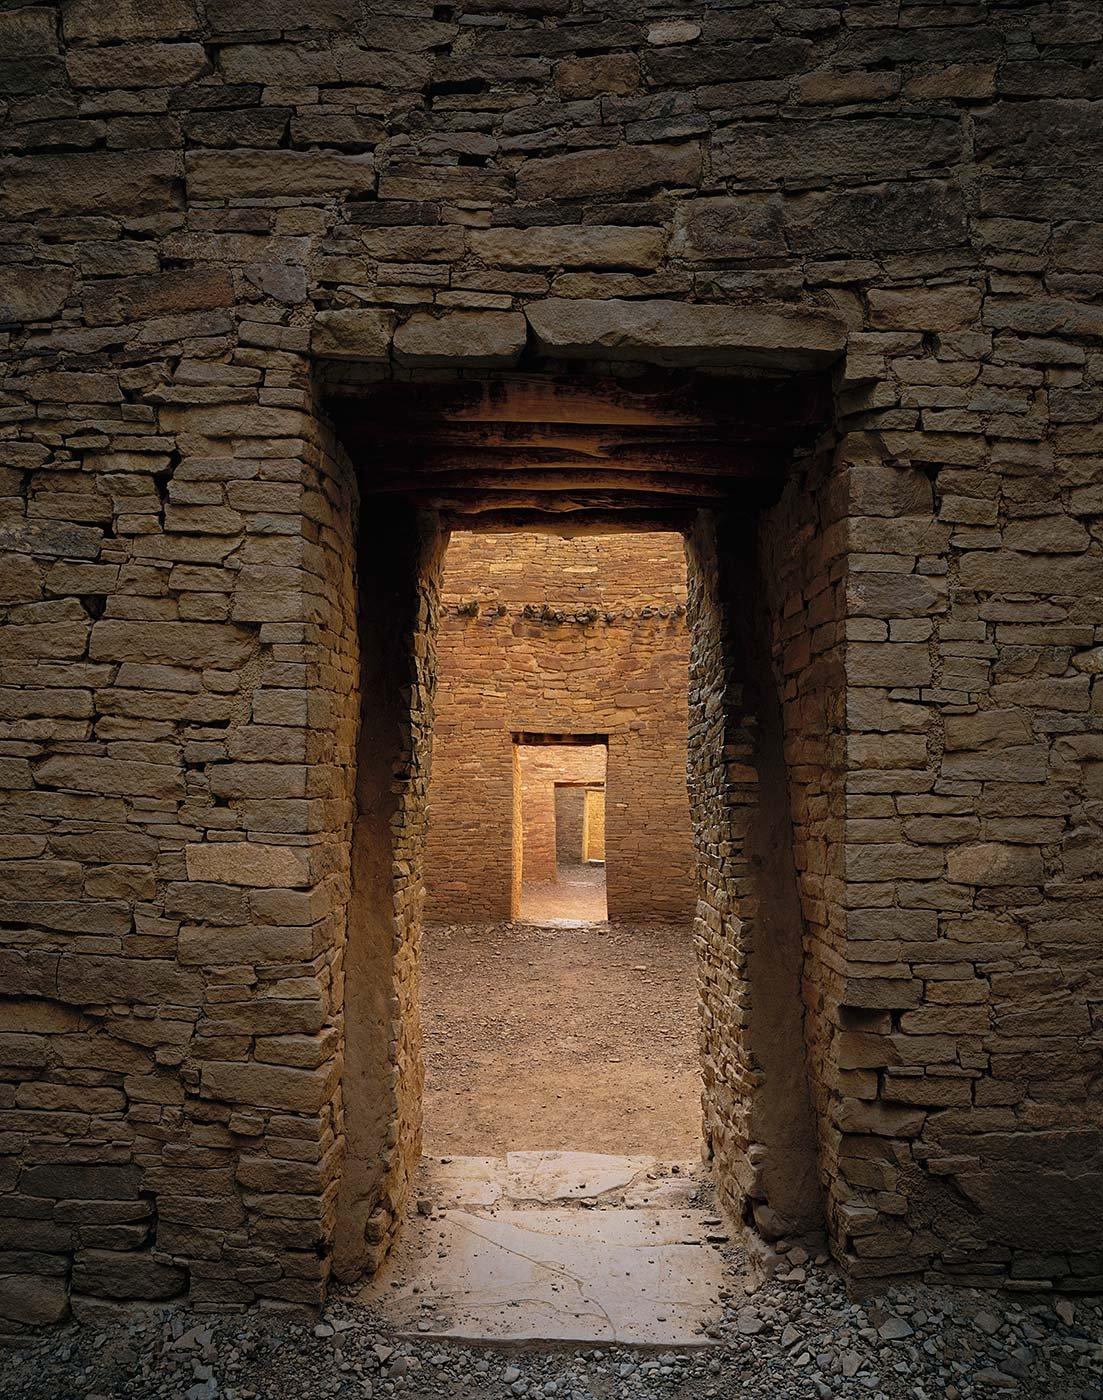 Image of Illuminated Doorways, Chaco Canyon National Park, New Mexico